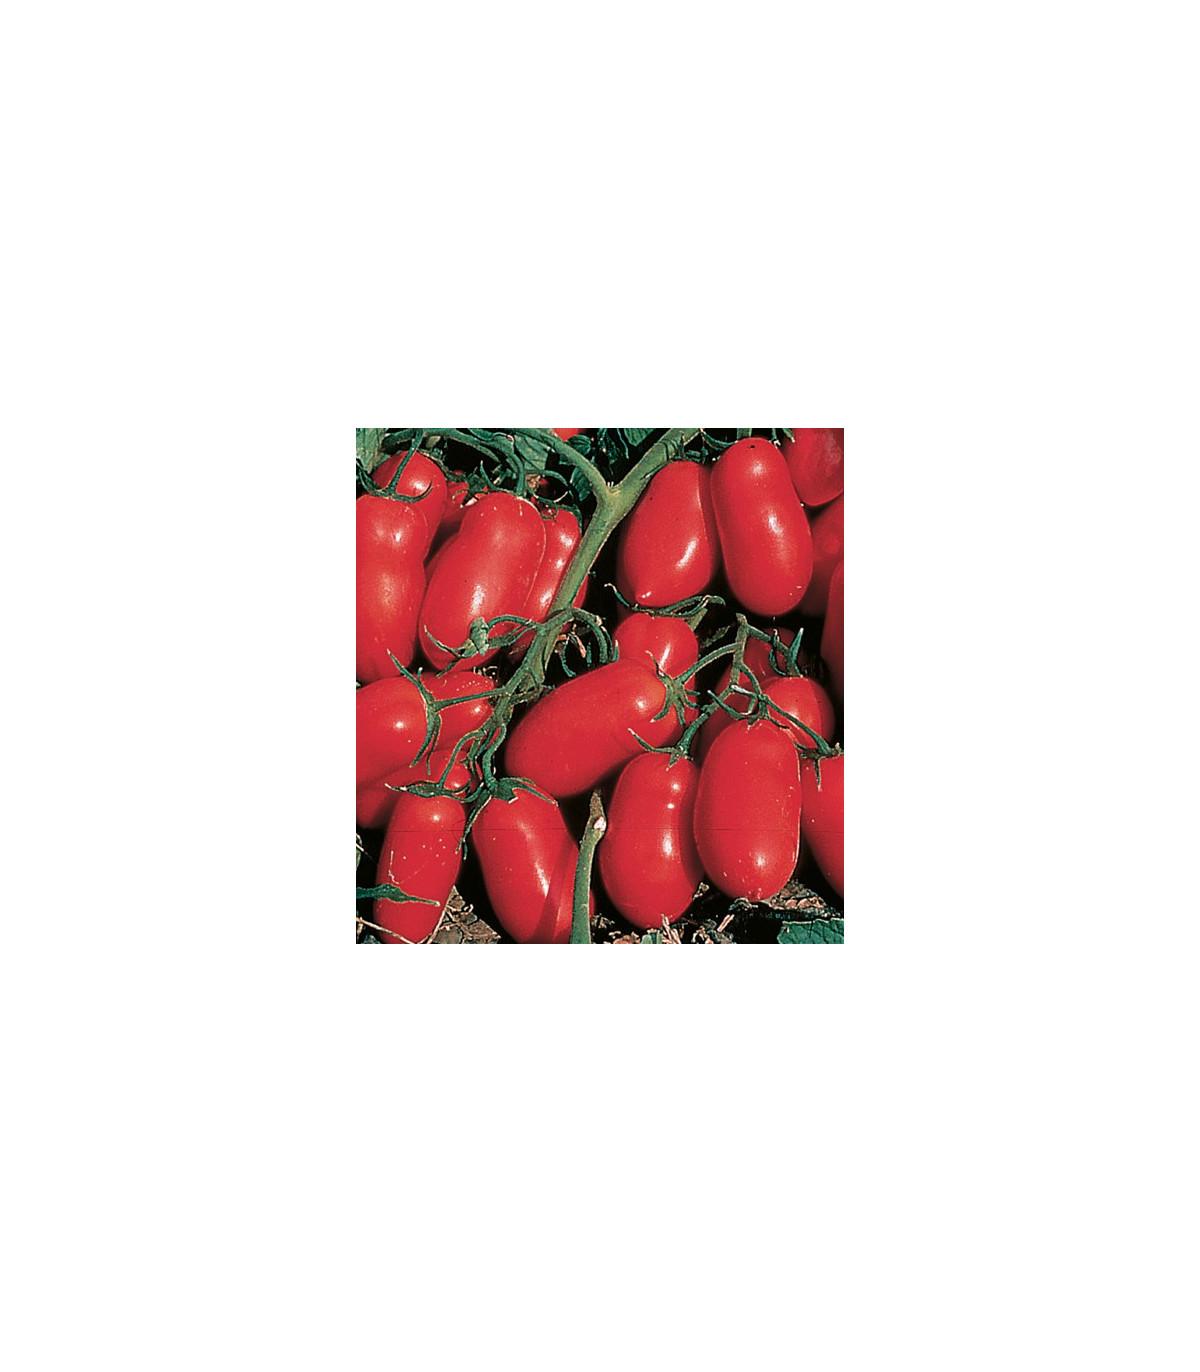 BIO Rajče keříčkové Inka F1 - bio osivo Rajčete - 10 ks